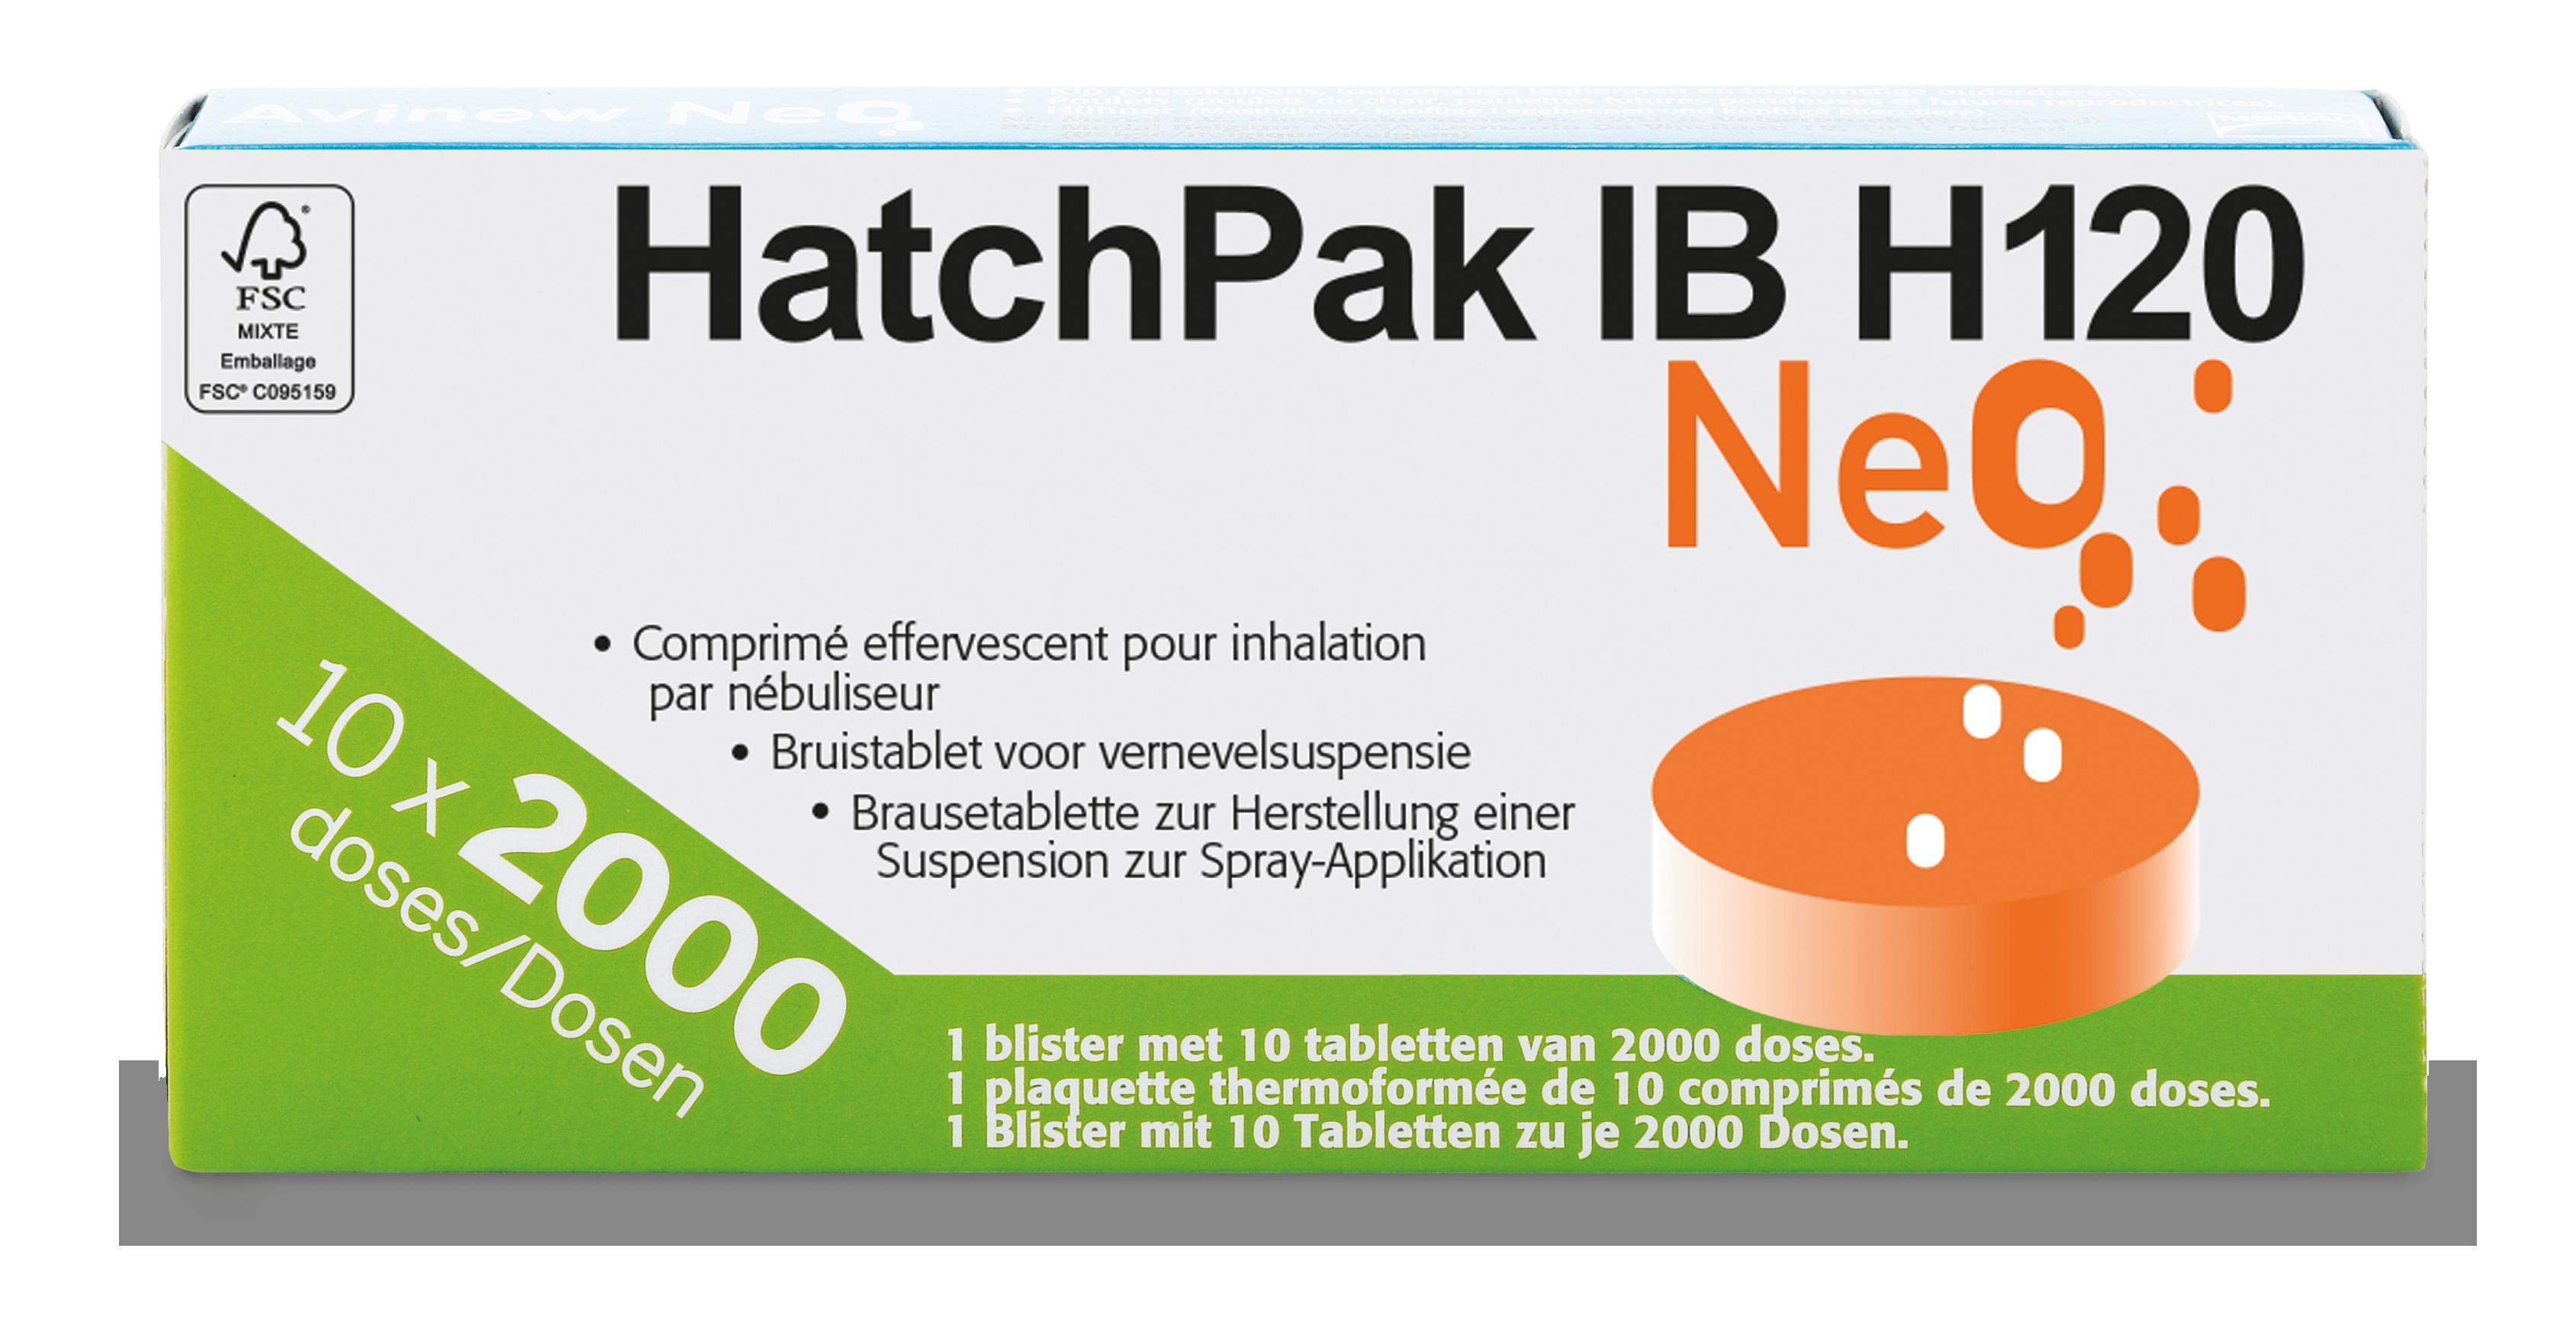 HatchPak® IB H120 NeO